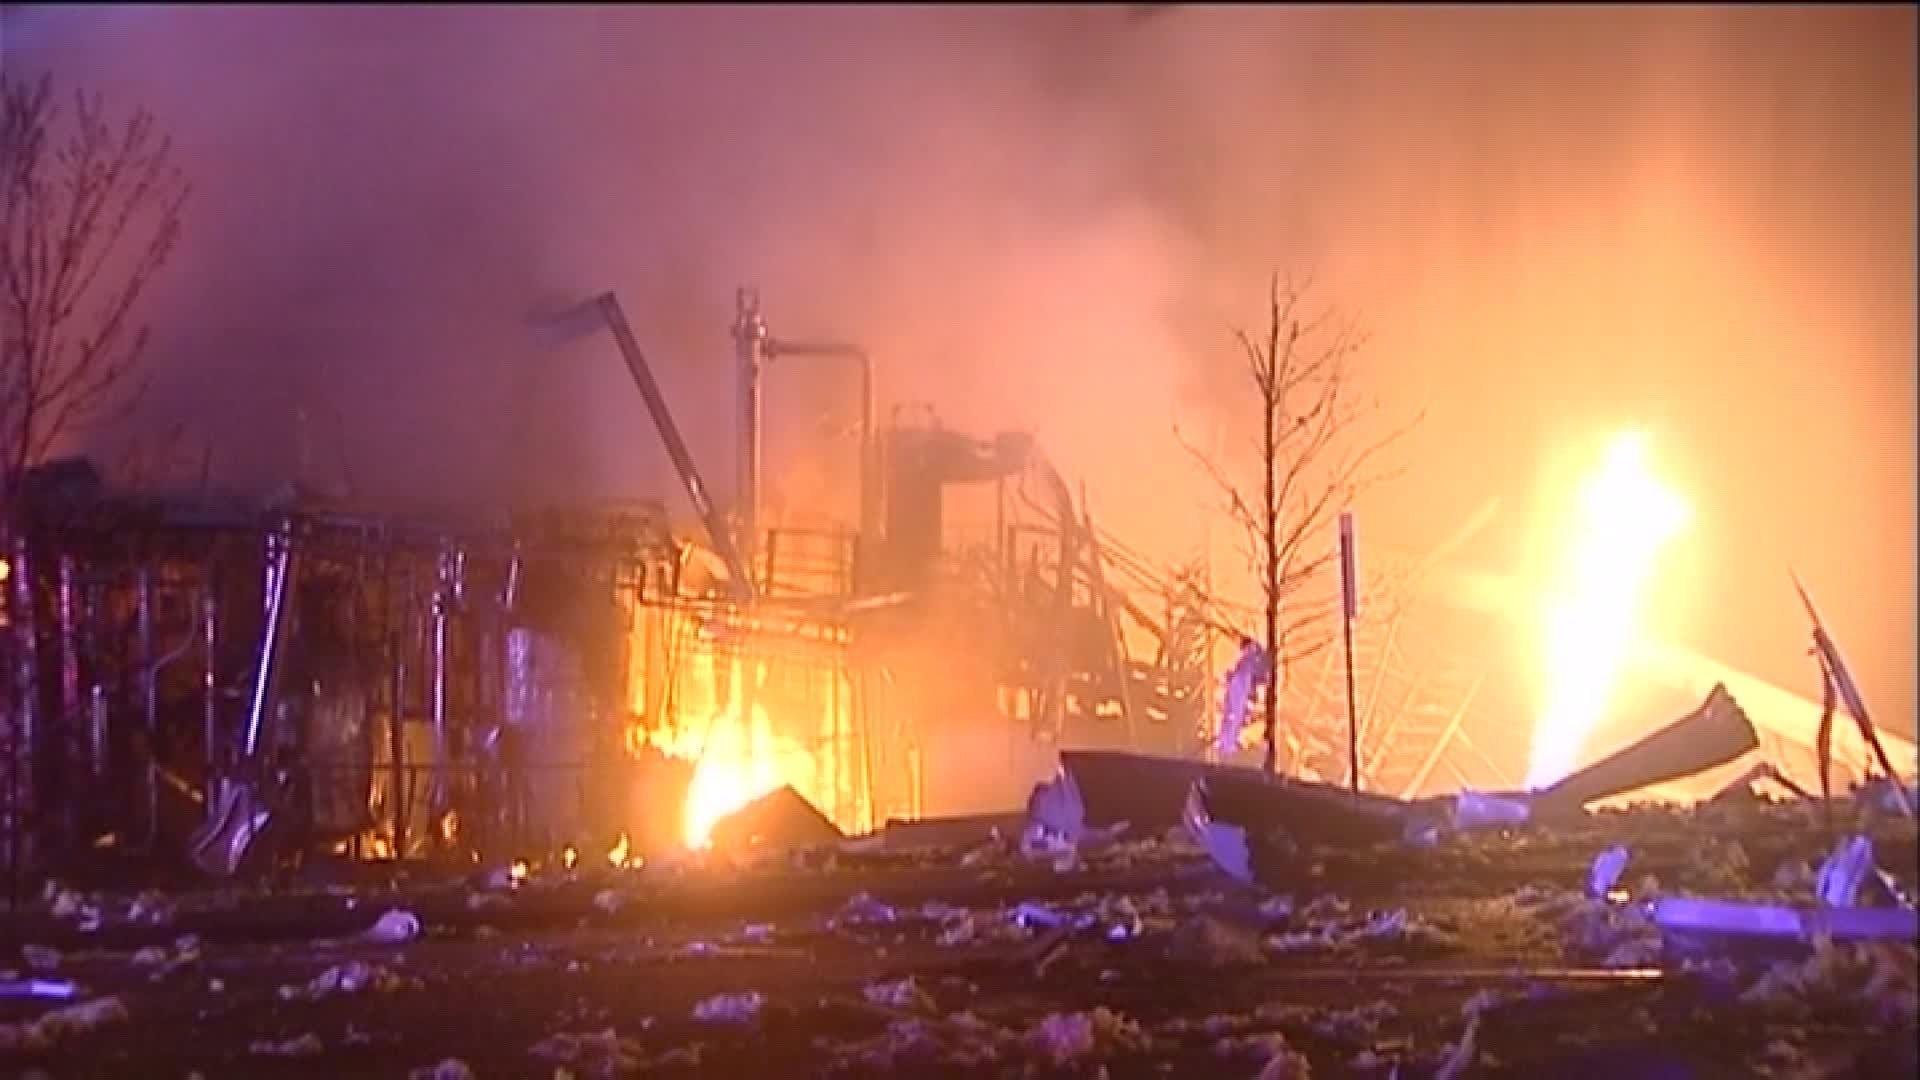 Massive Illinois plant explosion injures 4, leaves 3 missing